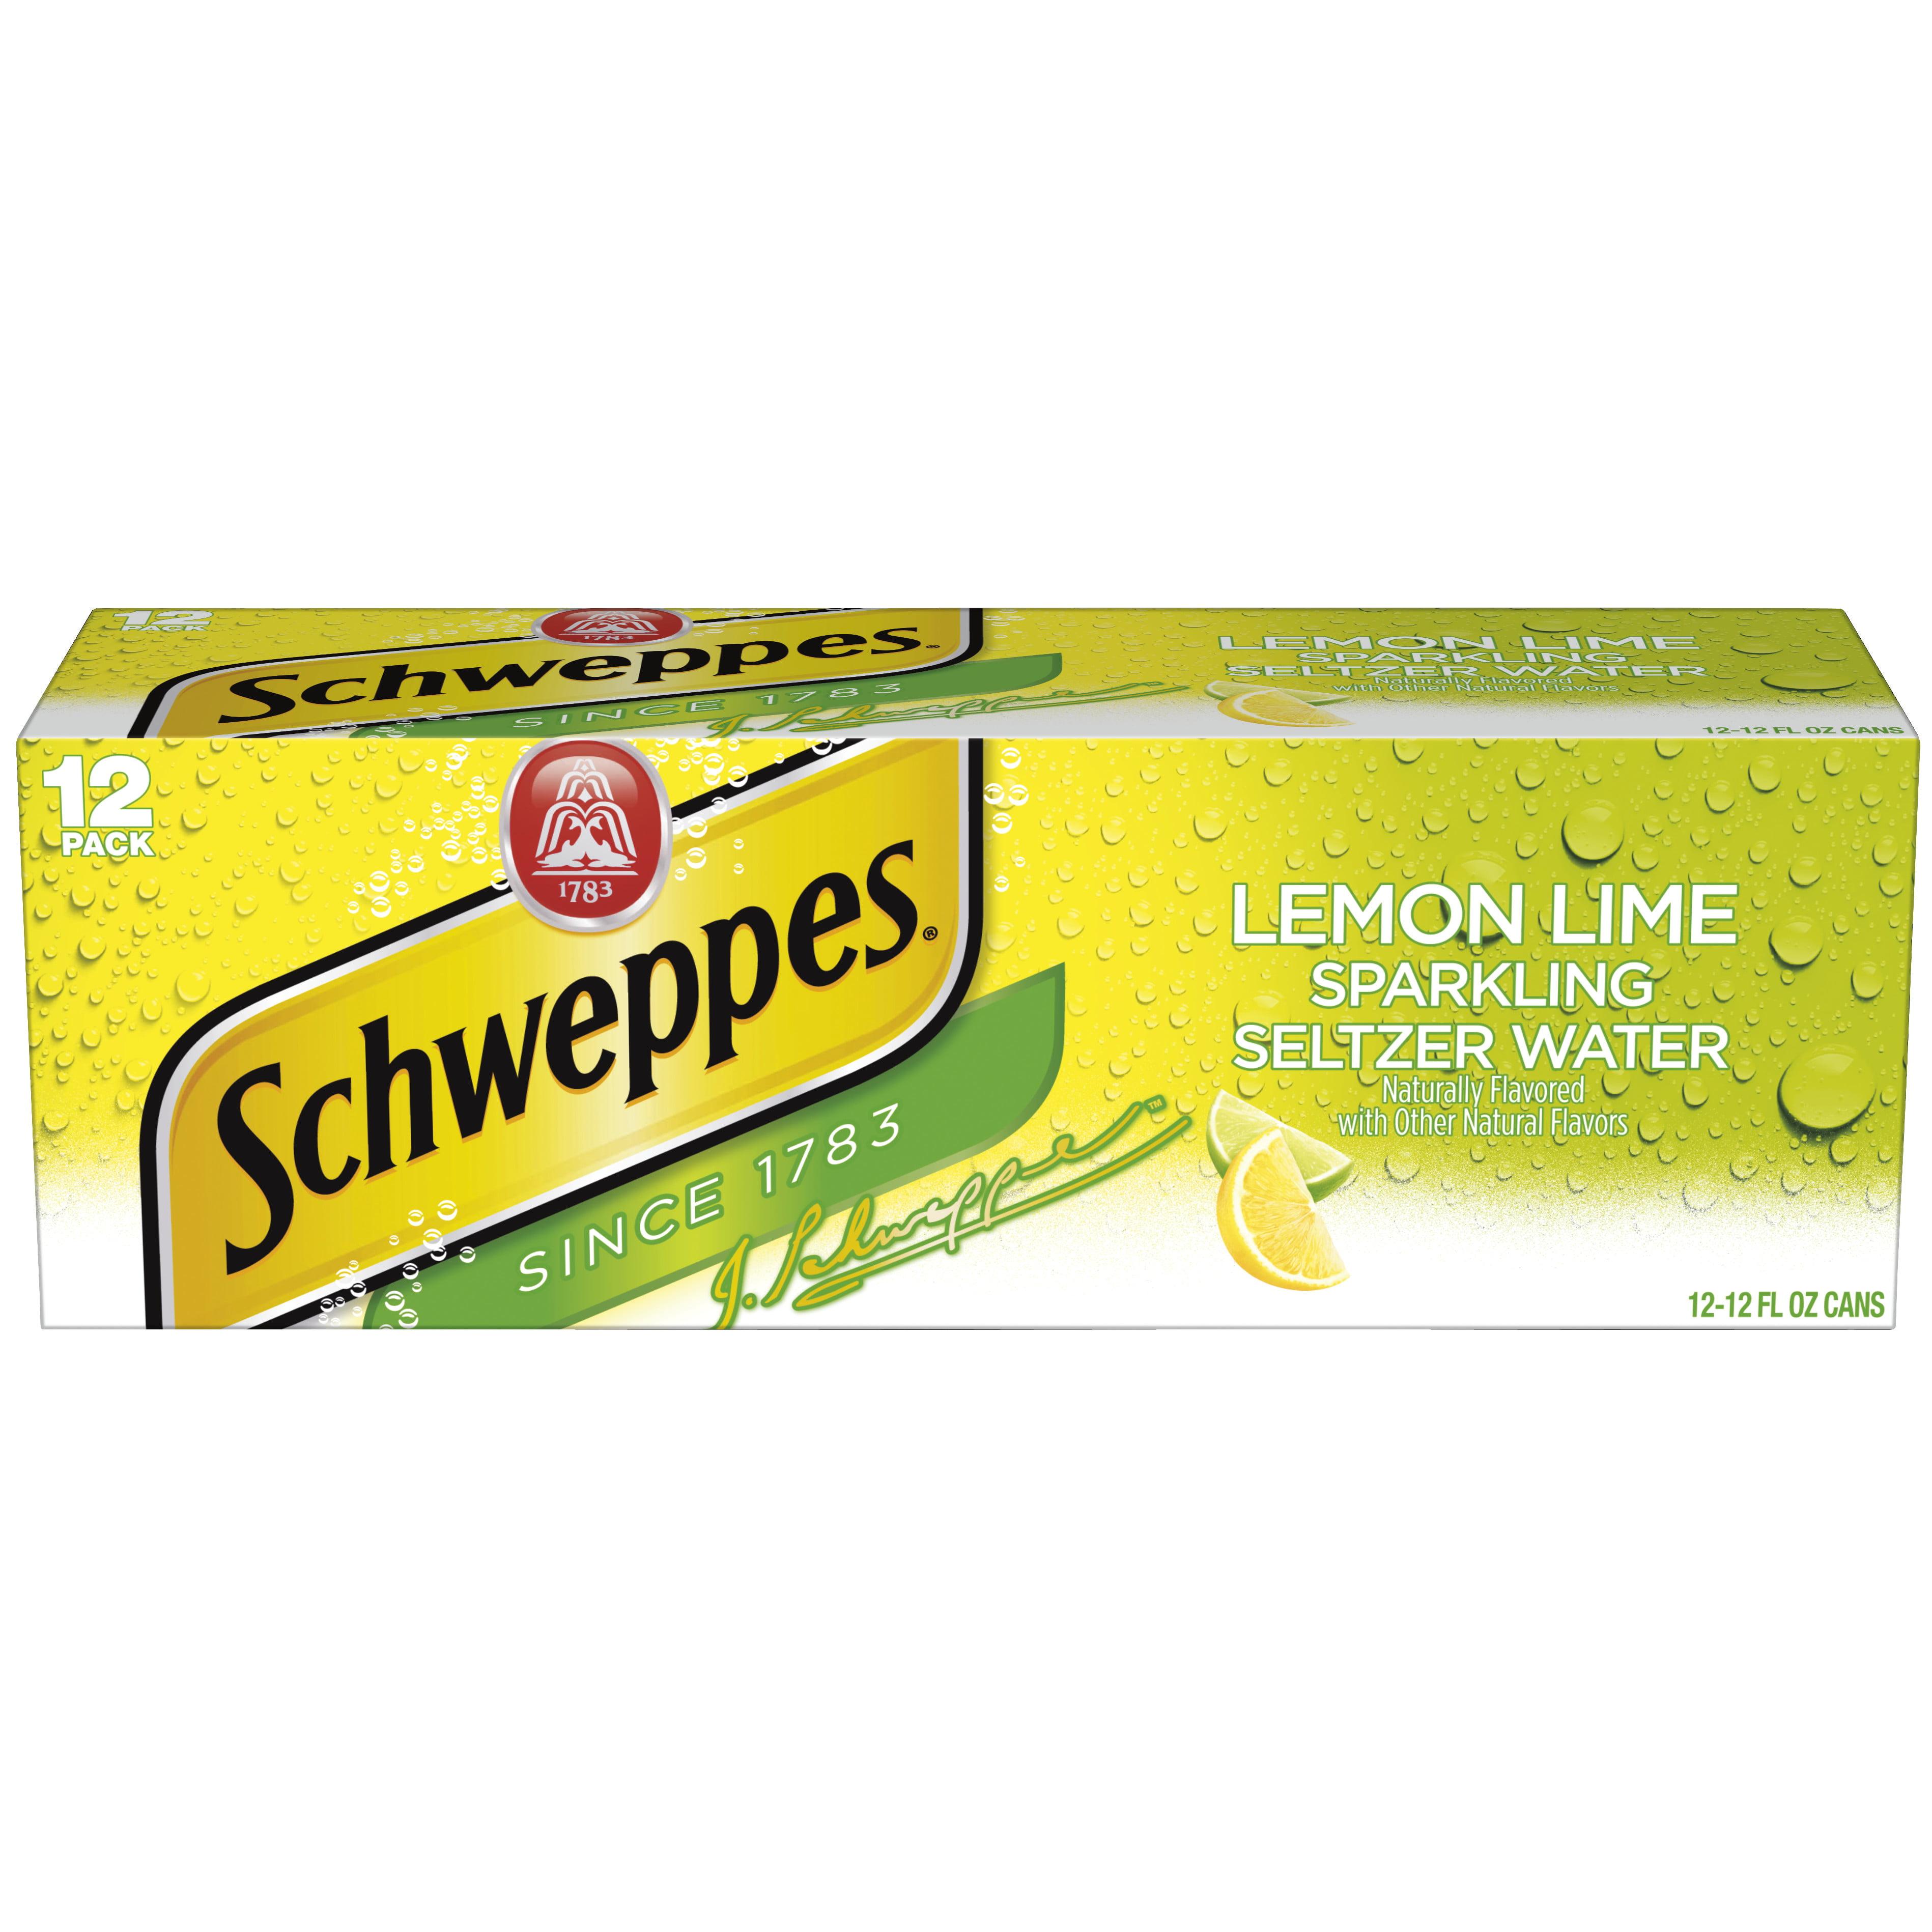 Schweppes Lemon Lime Sparkling Seltzer Water, 12 fl oz, 12 pack